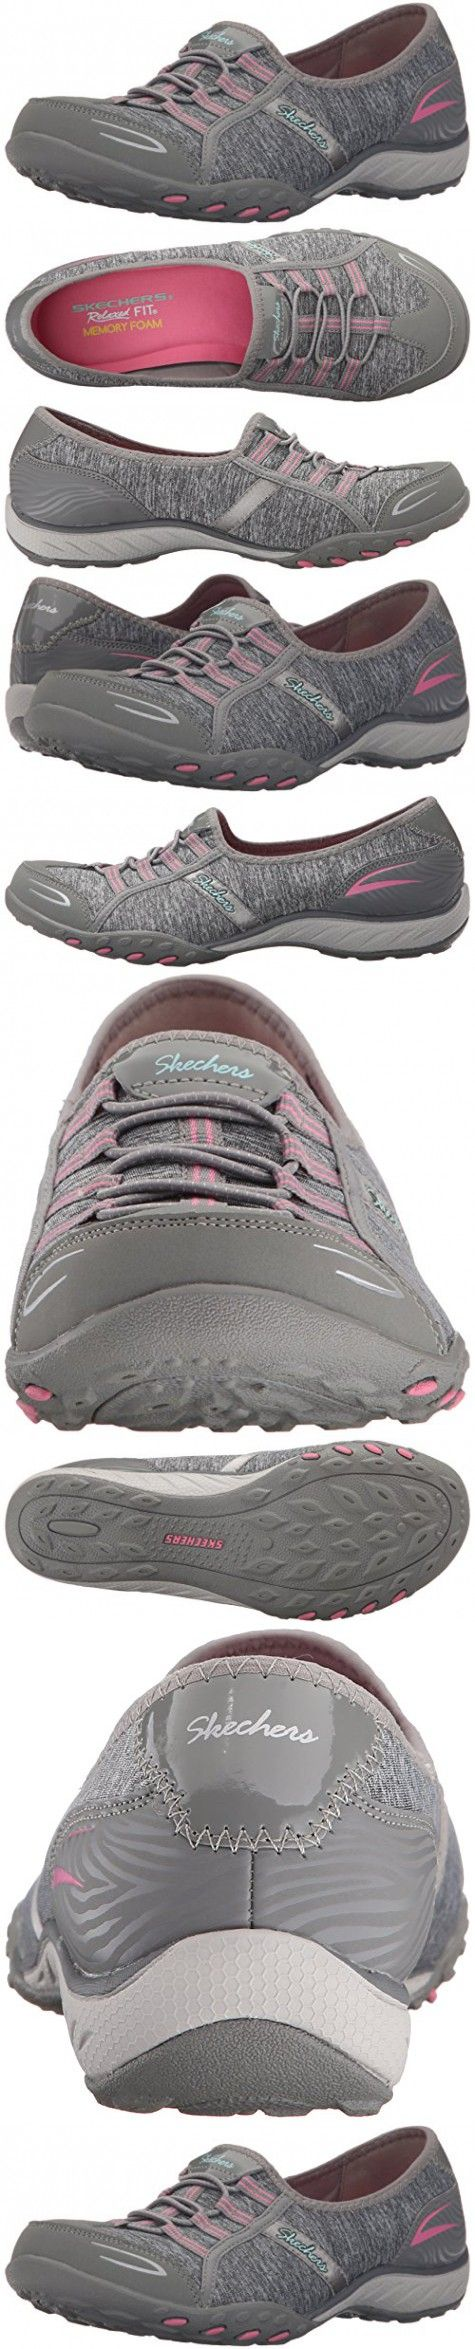 Zapatillas para caminar RYKA Women's Dash 3, gris / rosa, 8 M US